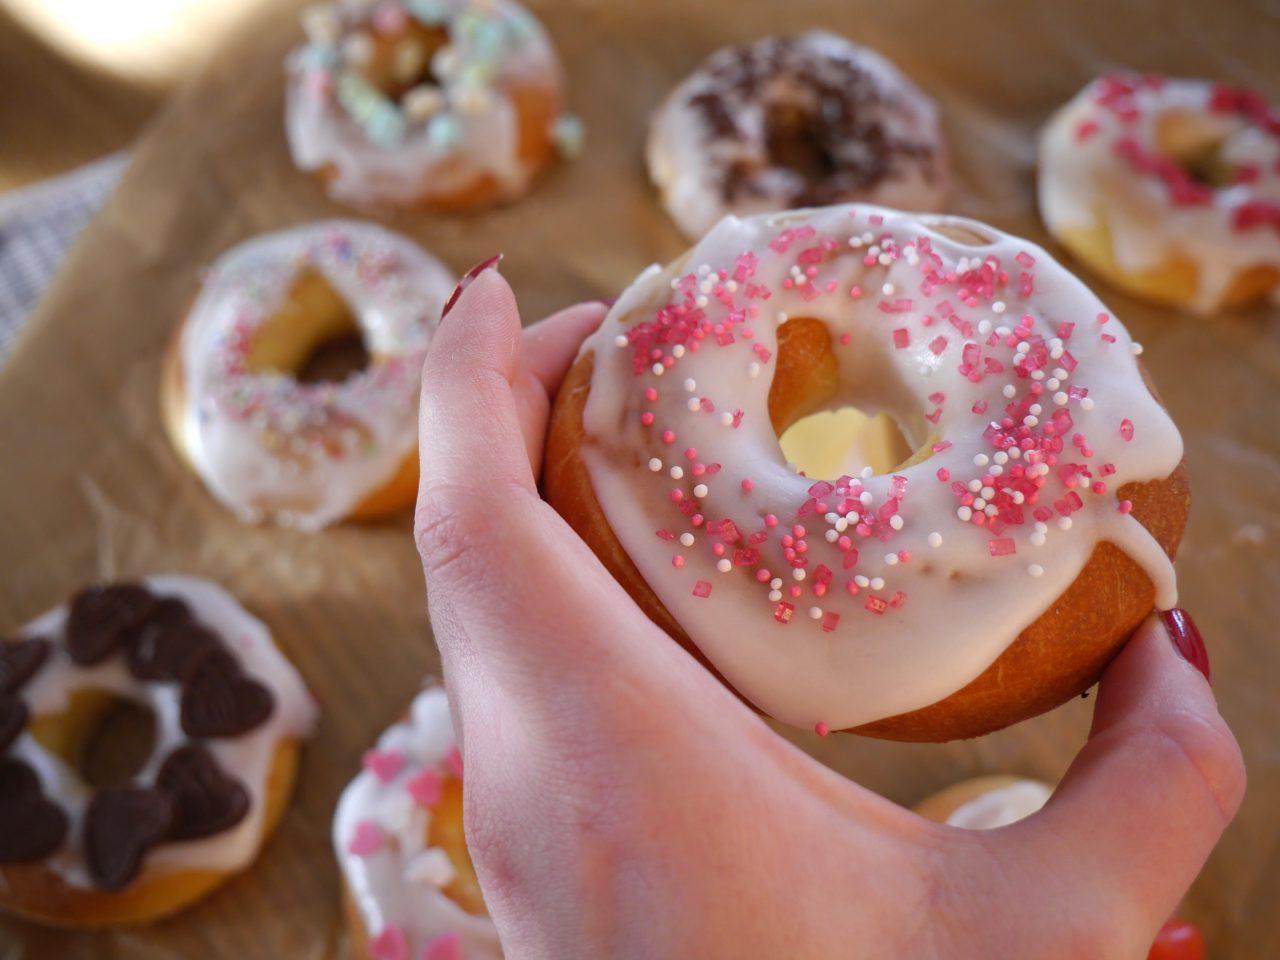 köln beste backen rezepte zitronen donuts